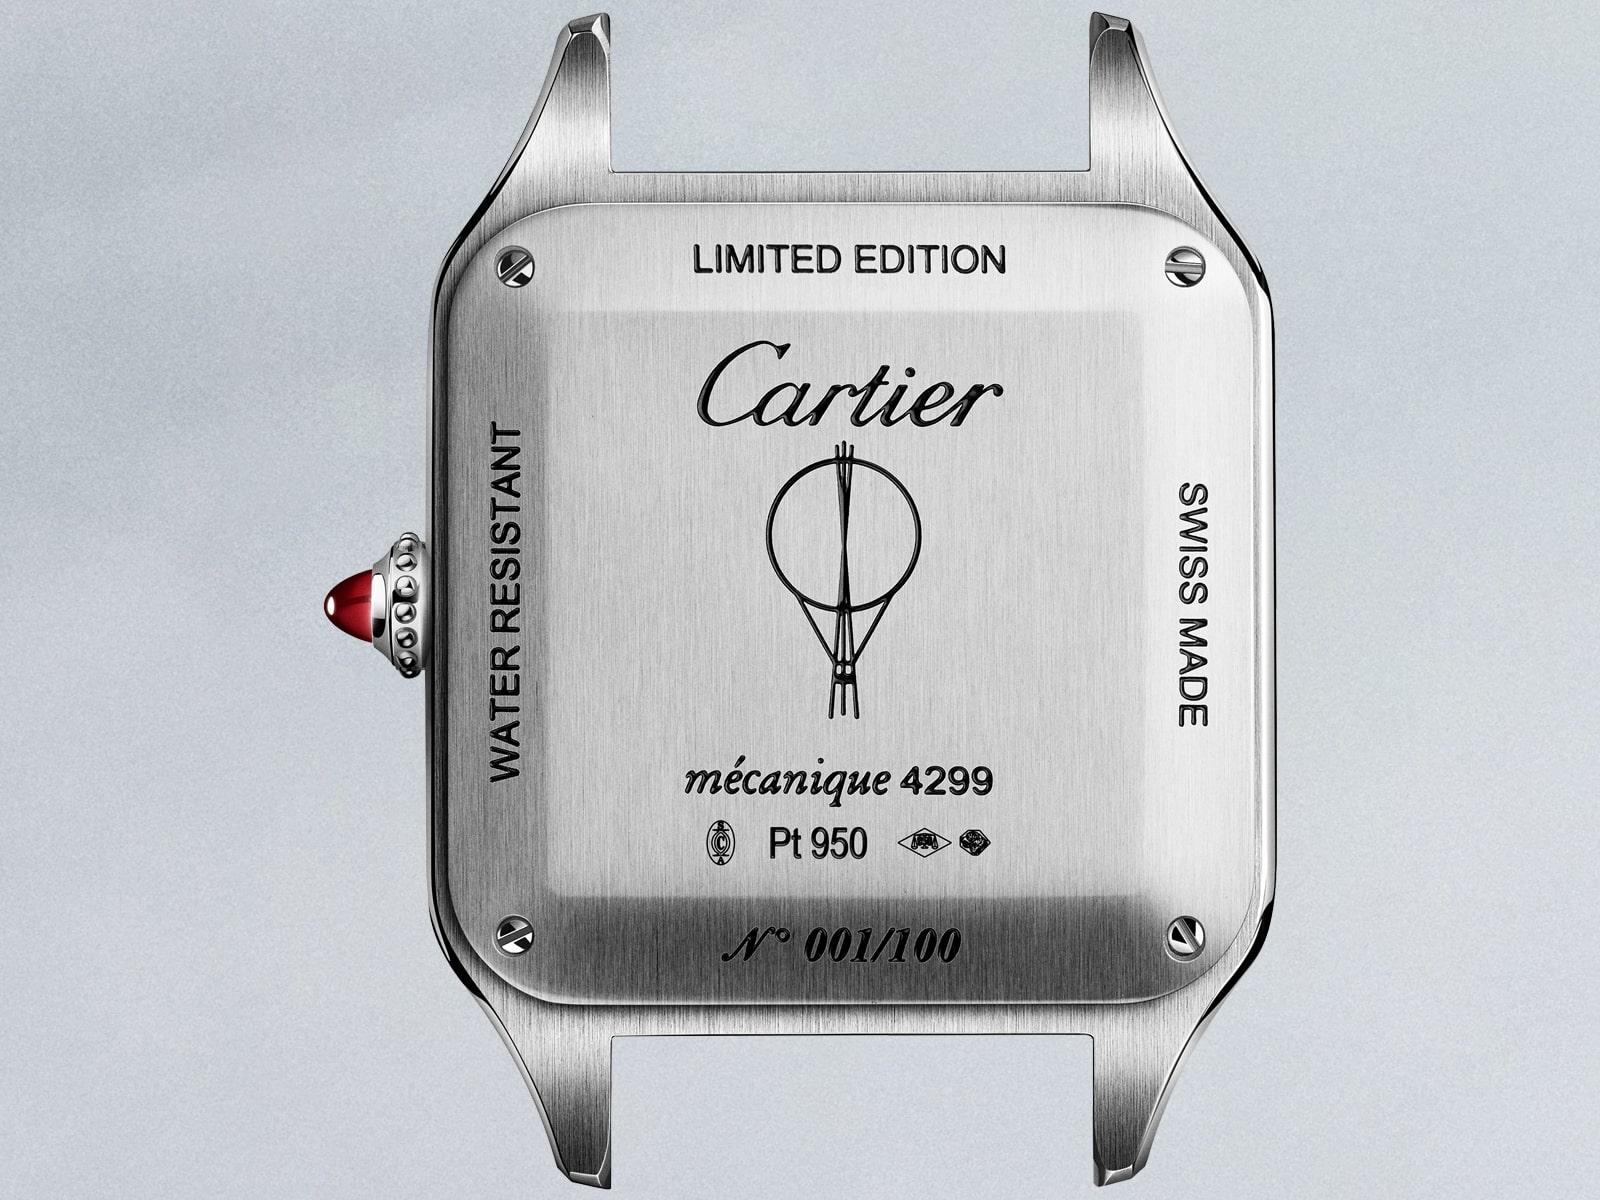 cartier-santos-dumont-limited-edition-le-bresil-3.jpg